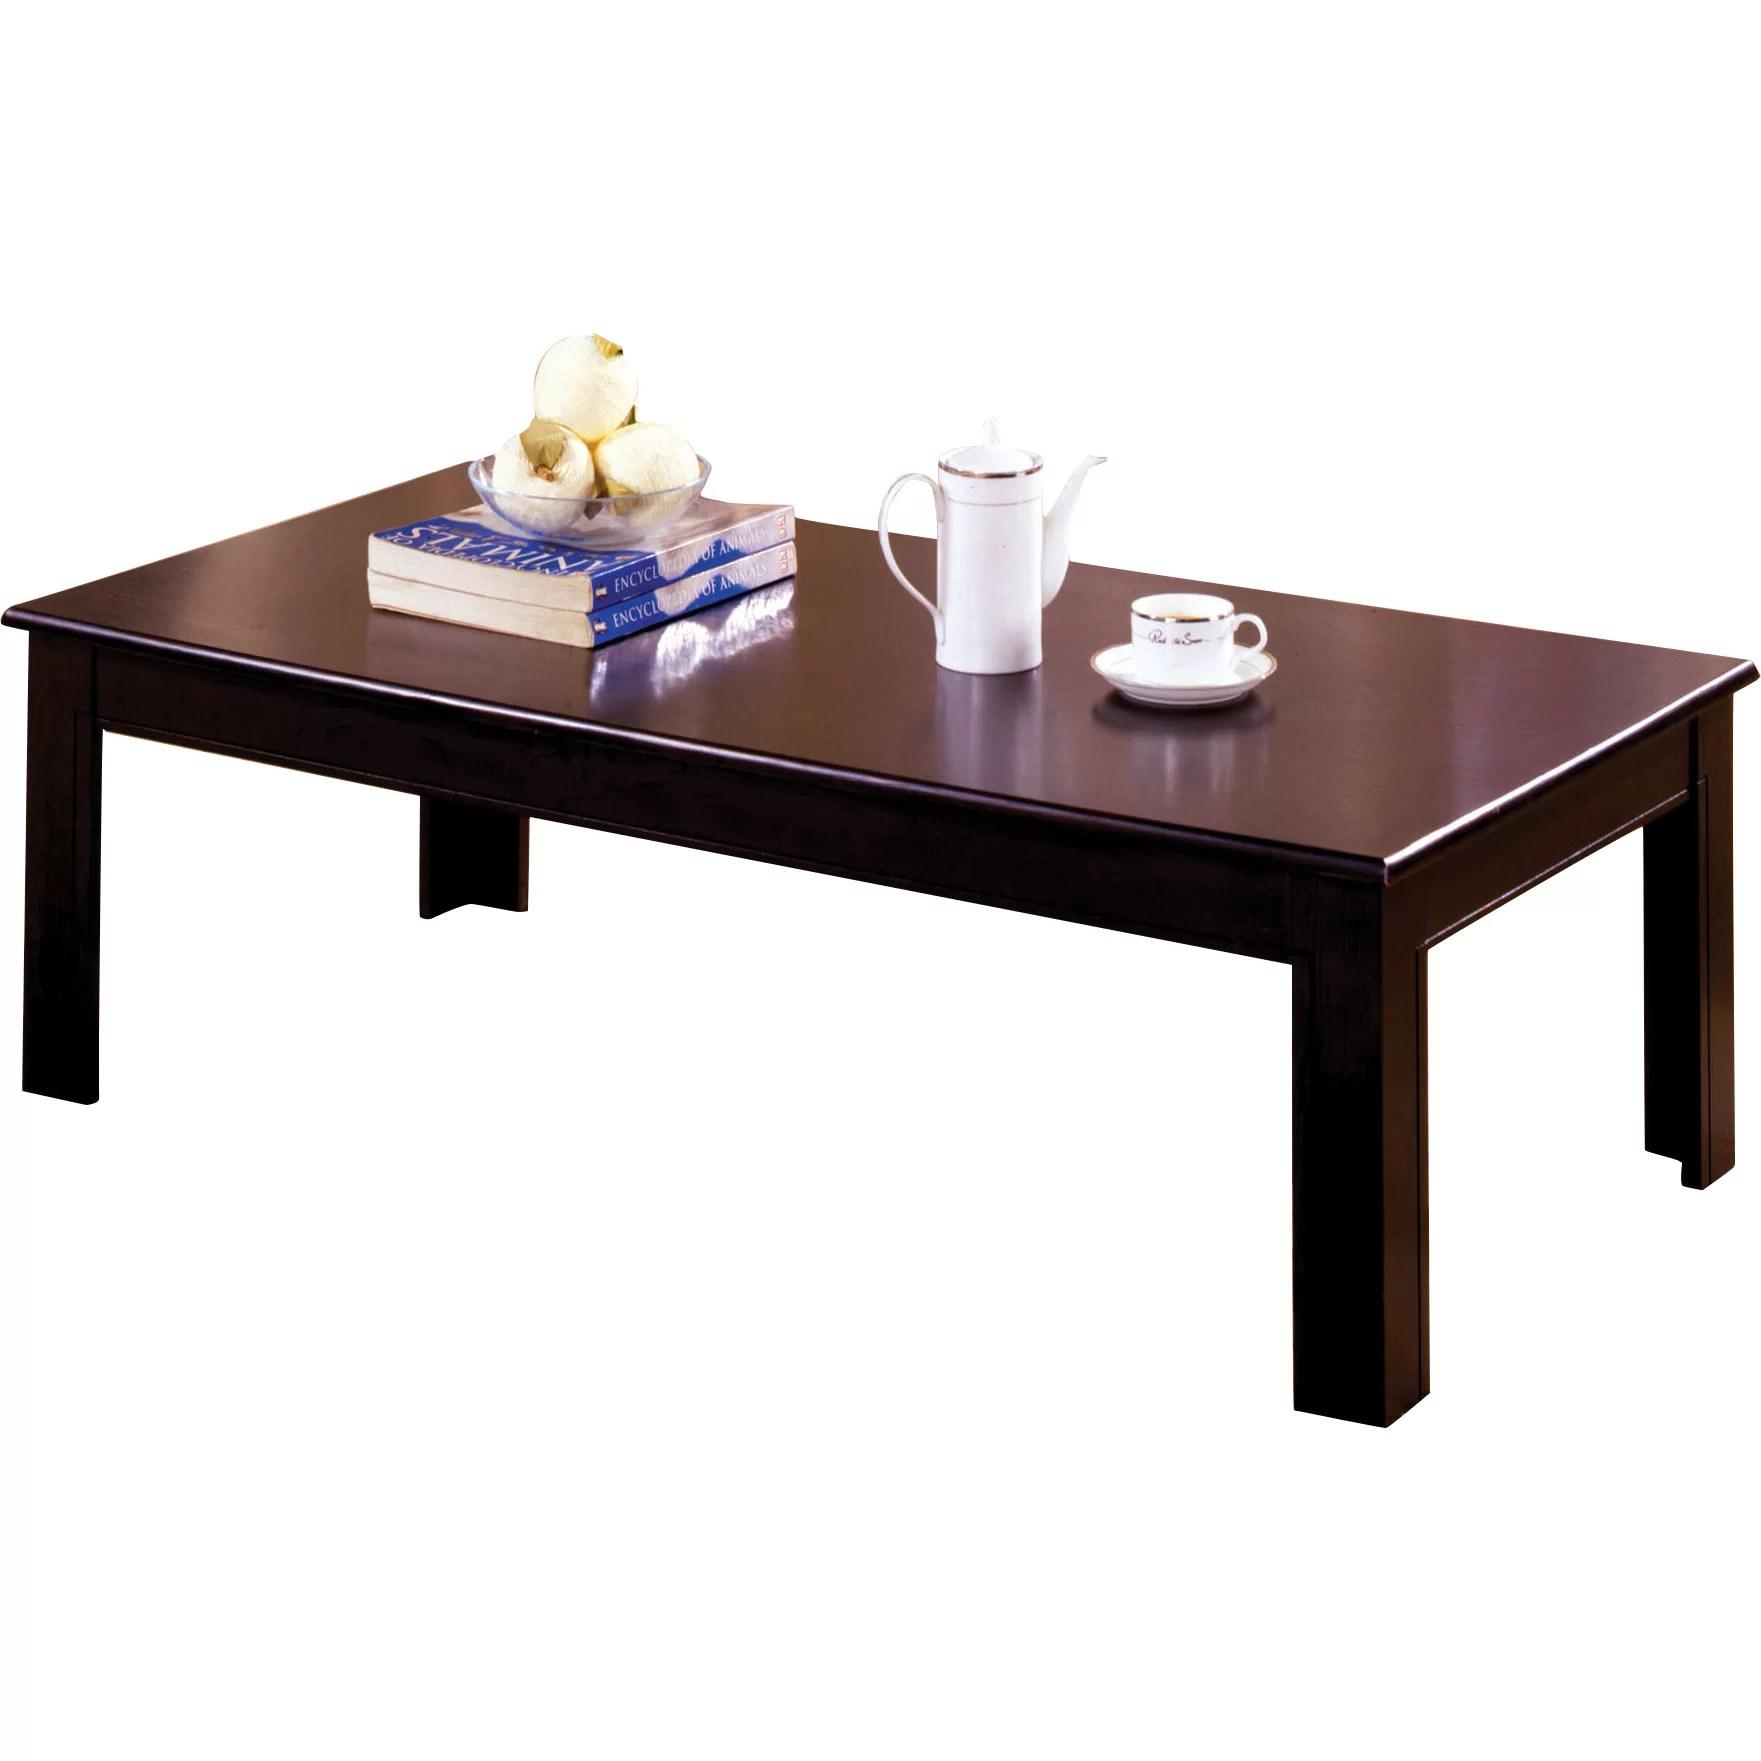 Hokku Designs Frixe 3 Piece Coffee Table Set & Reviews